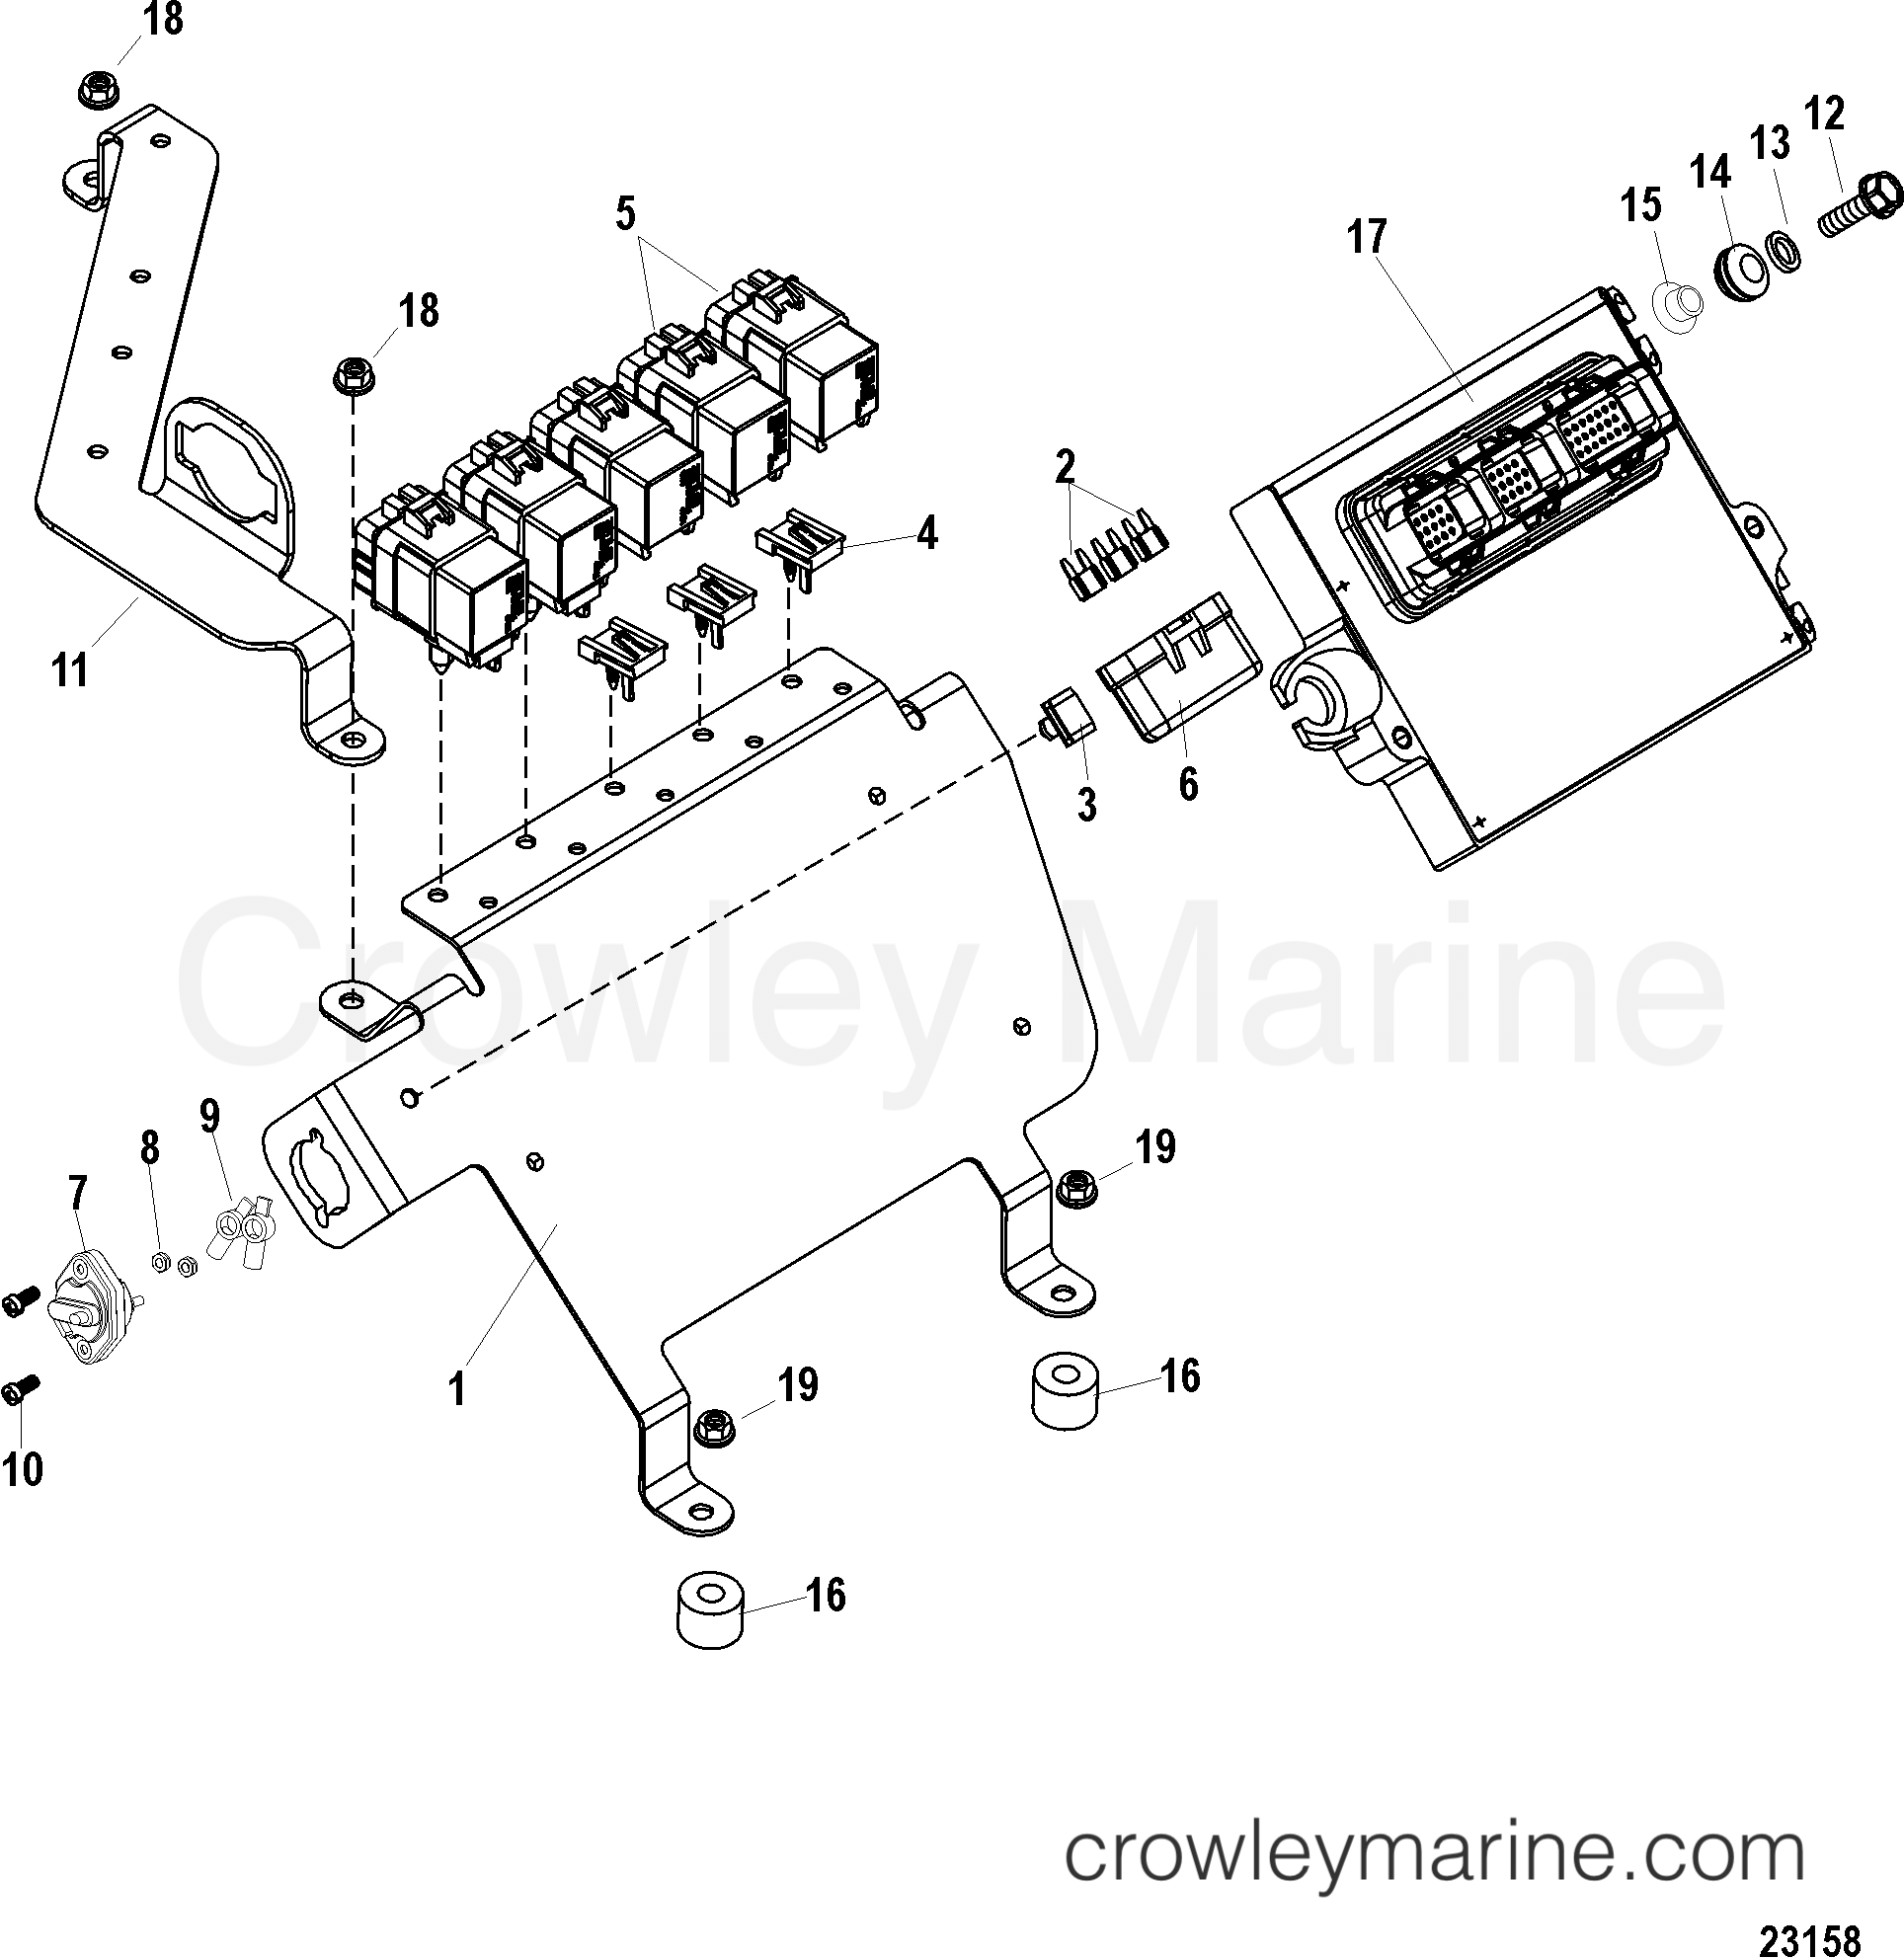 PCM AND BRACKET - 1998 Mercury Inboard Engine 8 1L HO [MPI